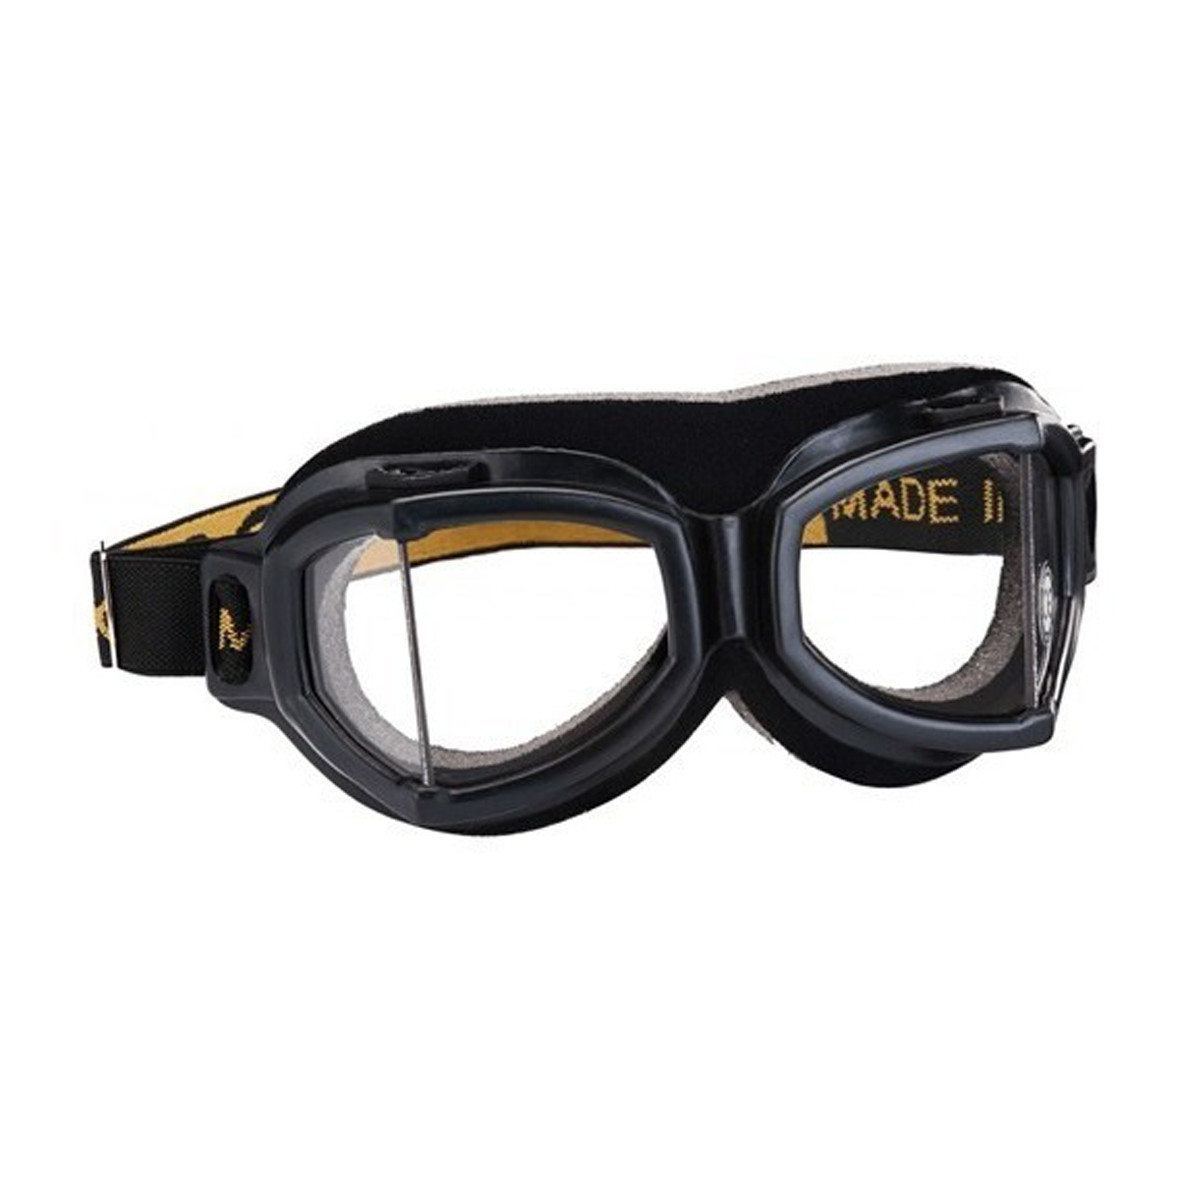 Antiparras Climax 518 Negro Oscuro Original